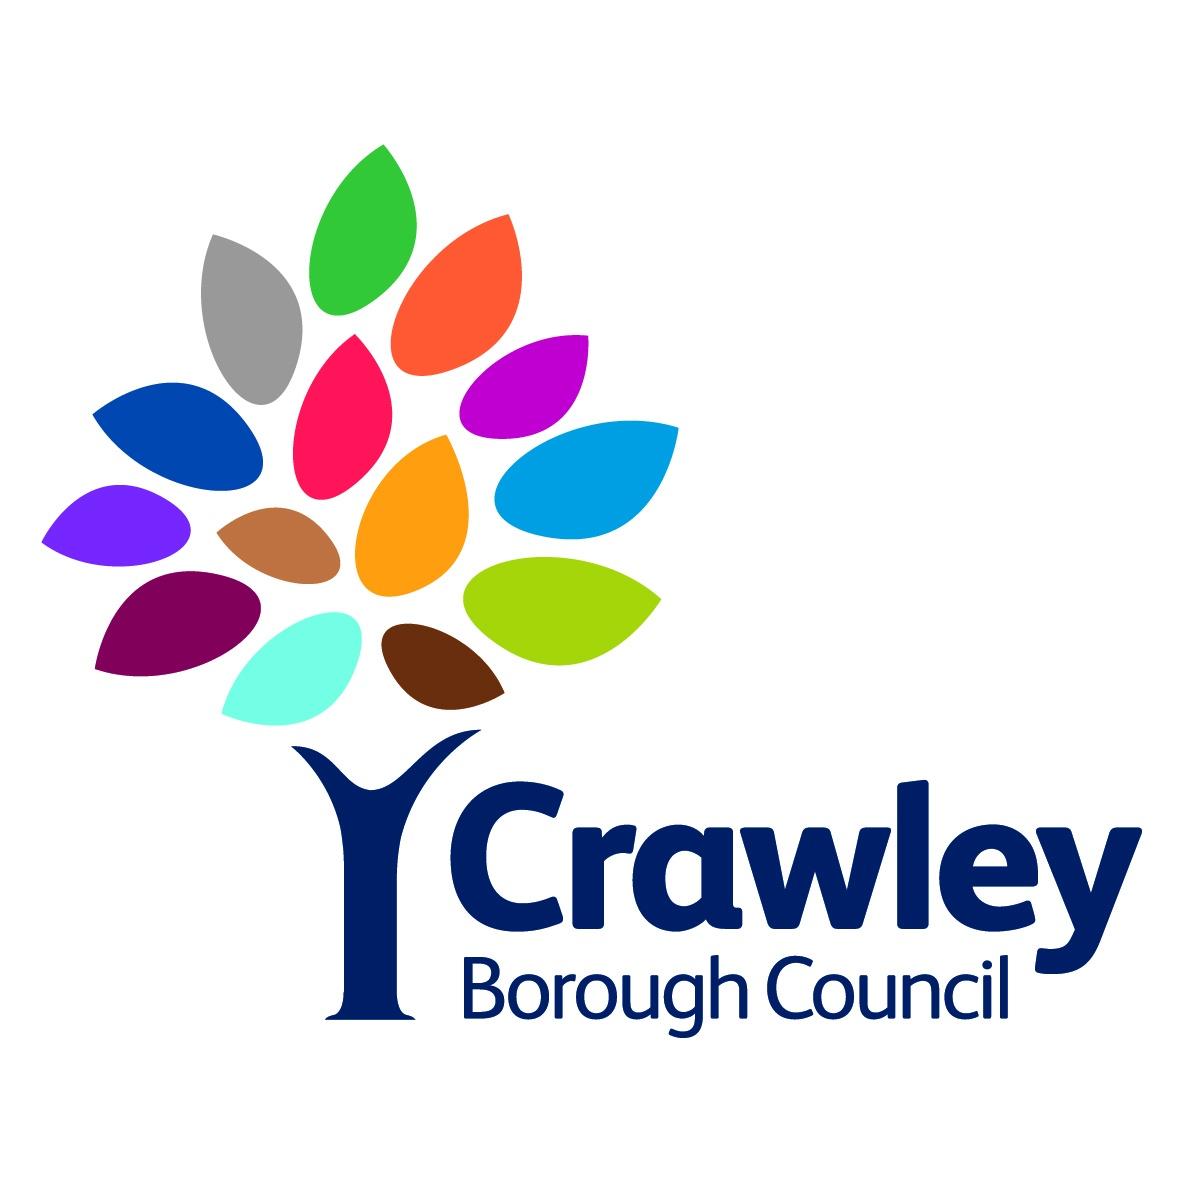 crawley_bc_logo_cmyk_1181